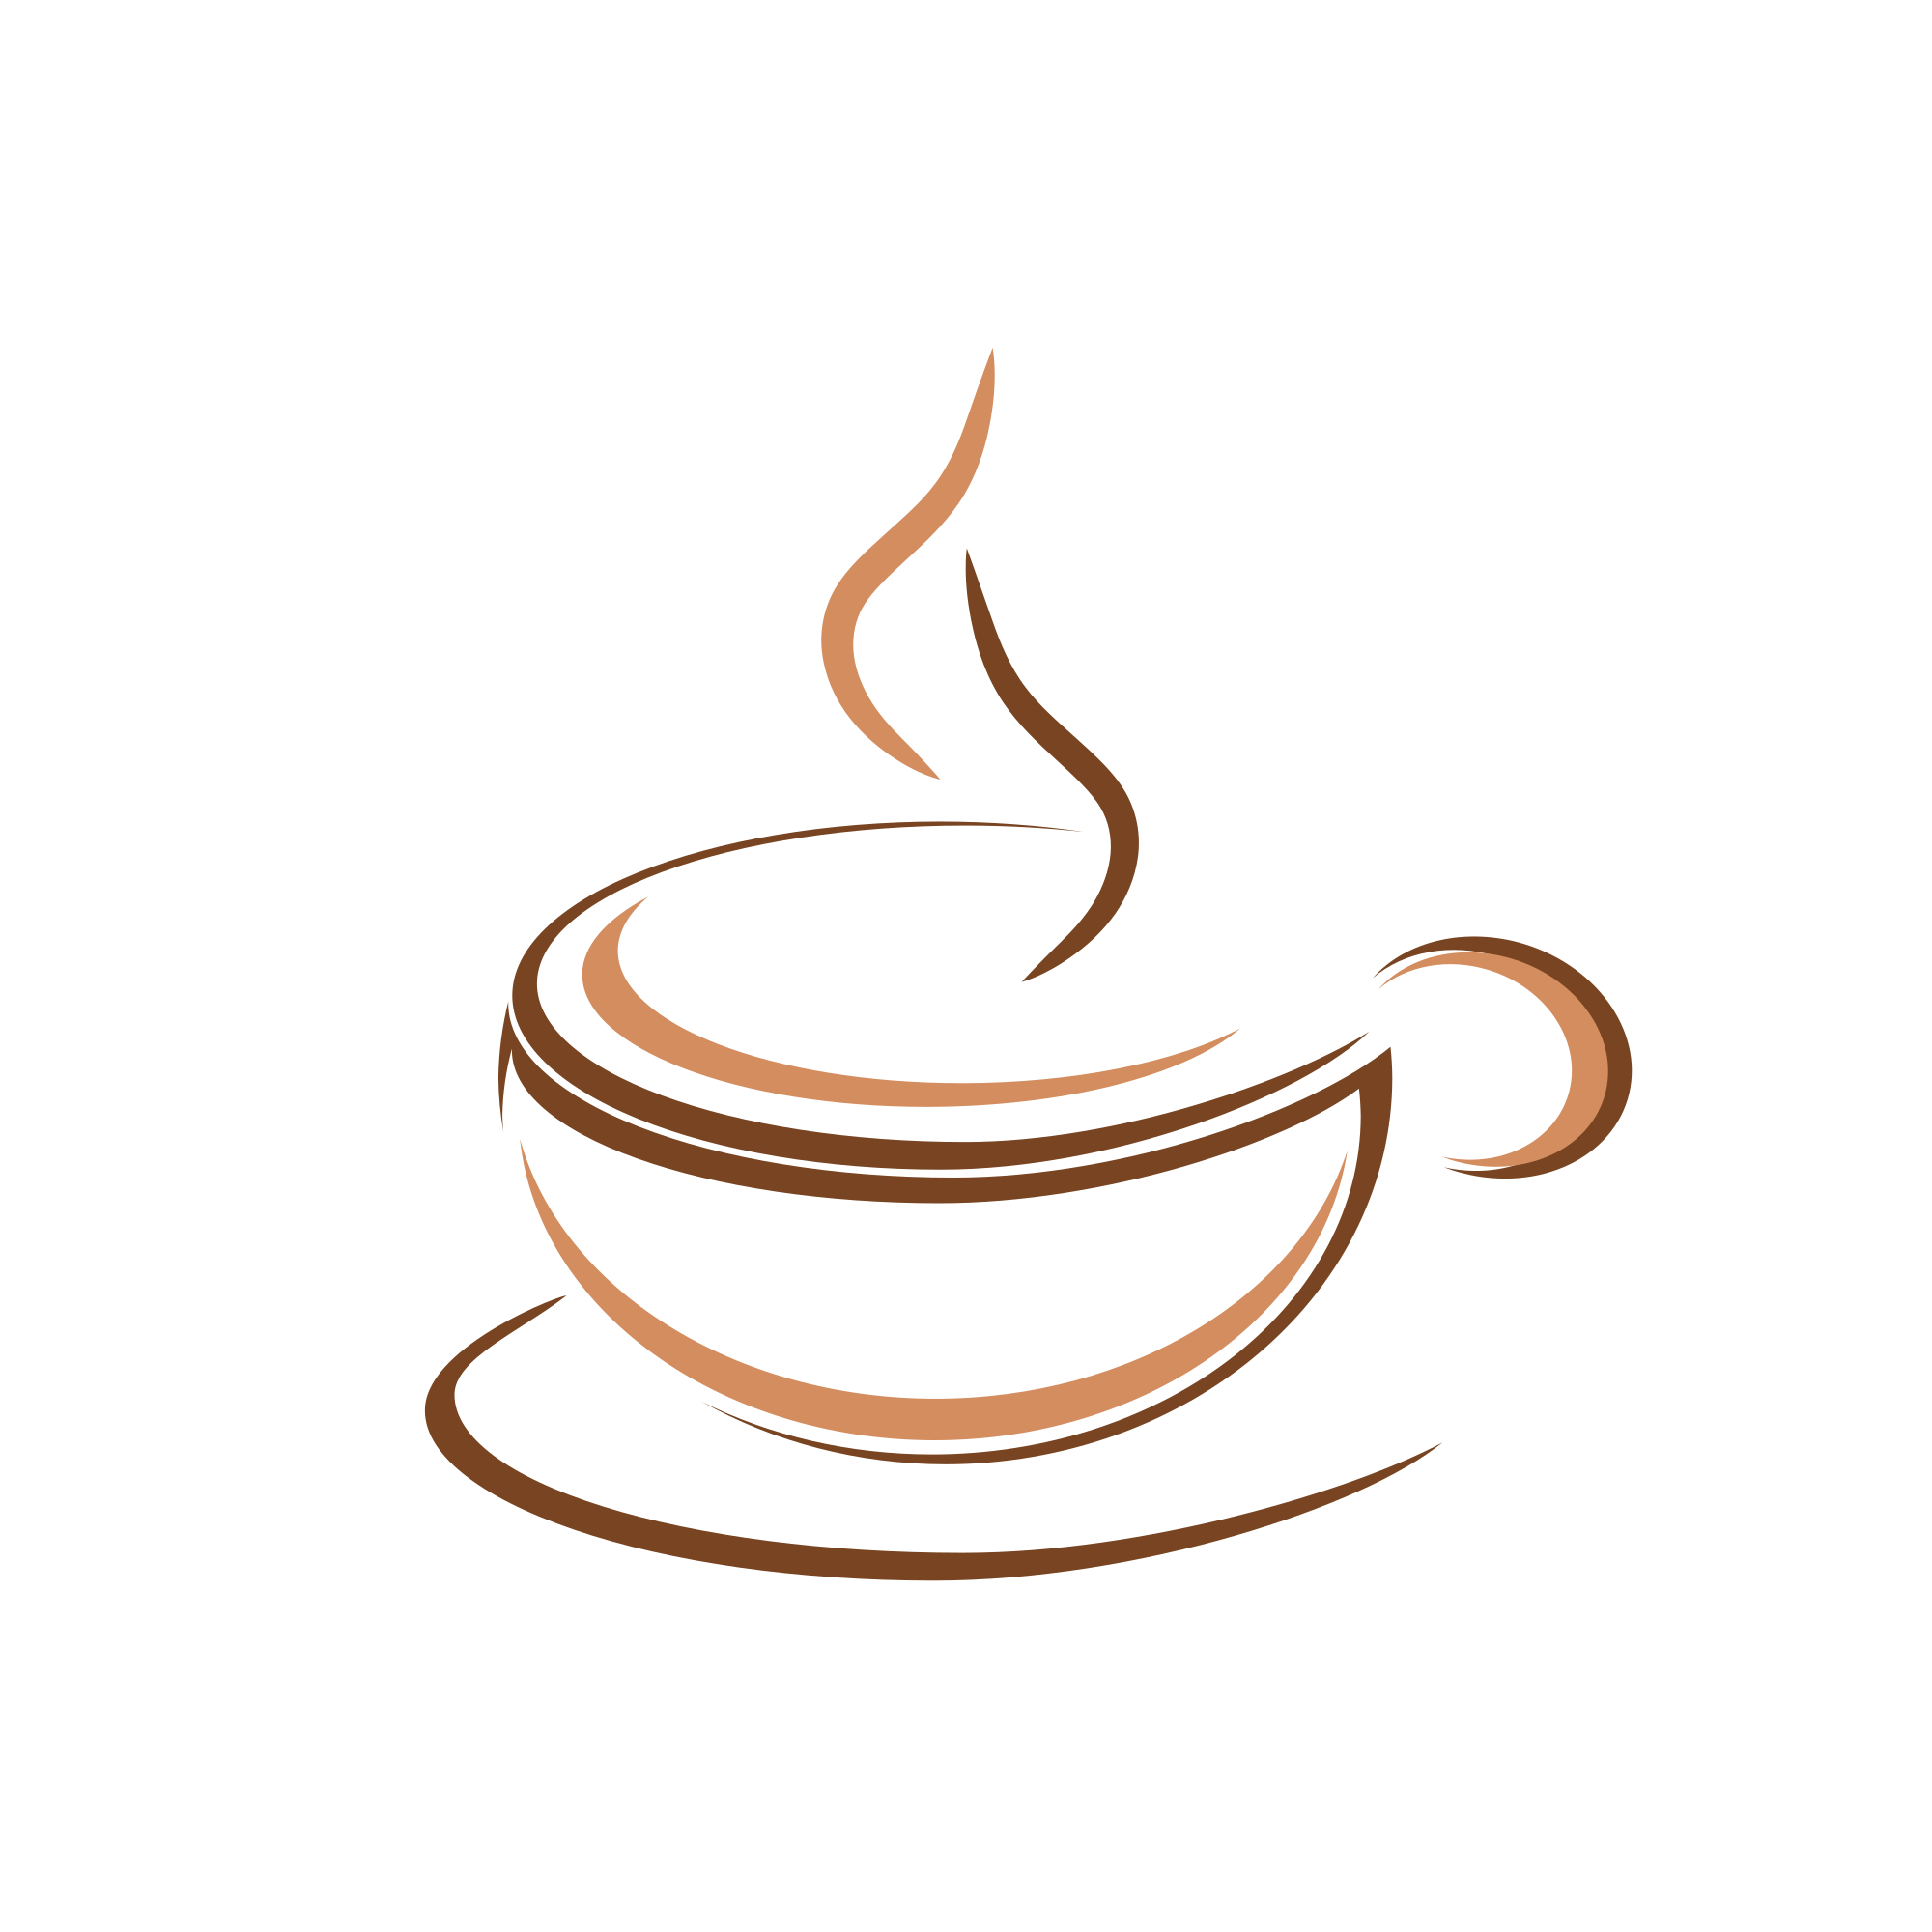 Coffee Logo Png.